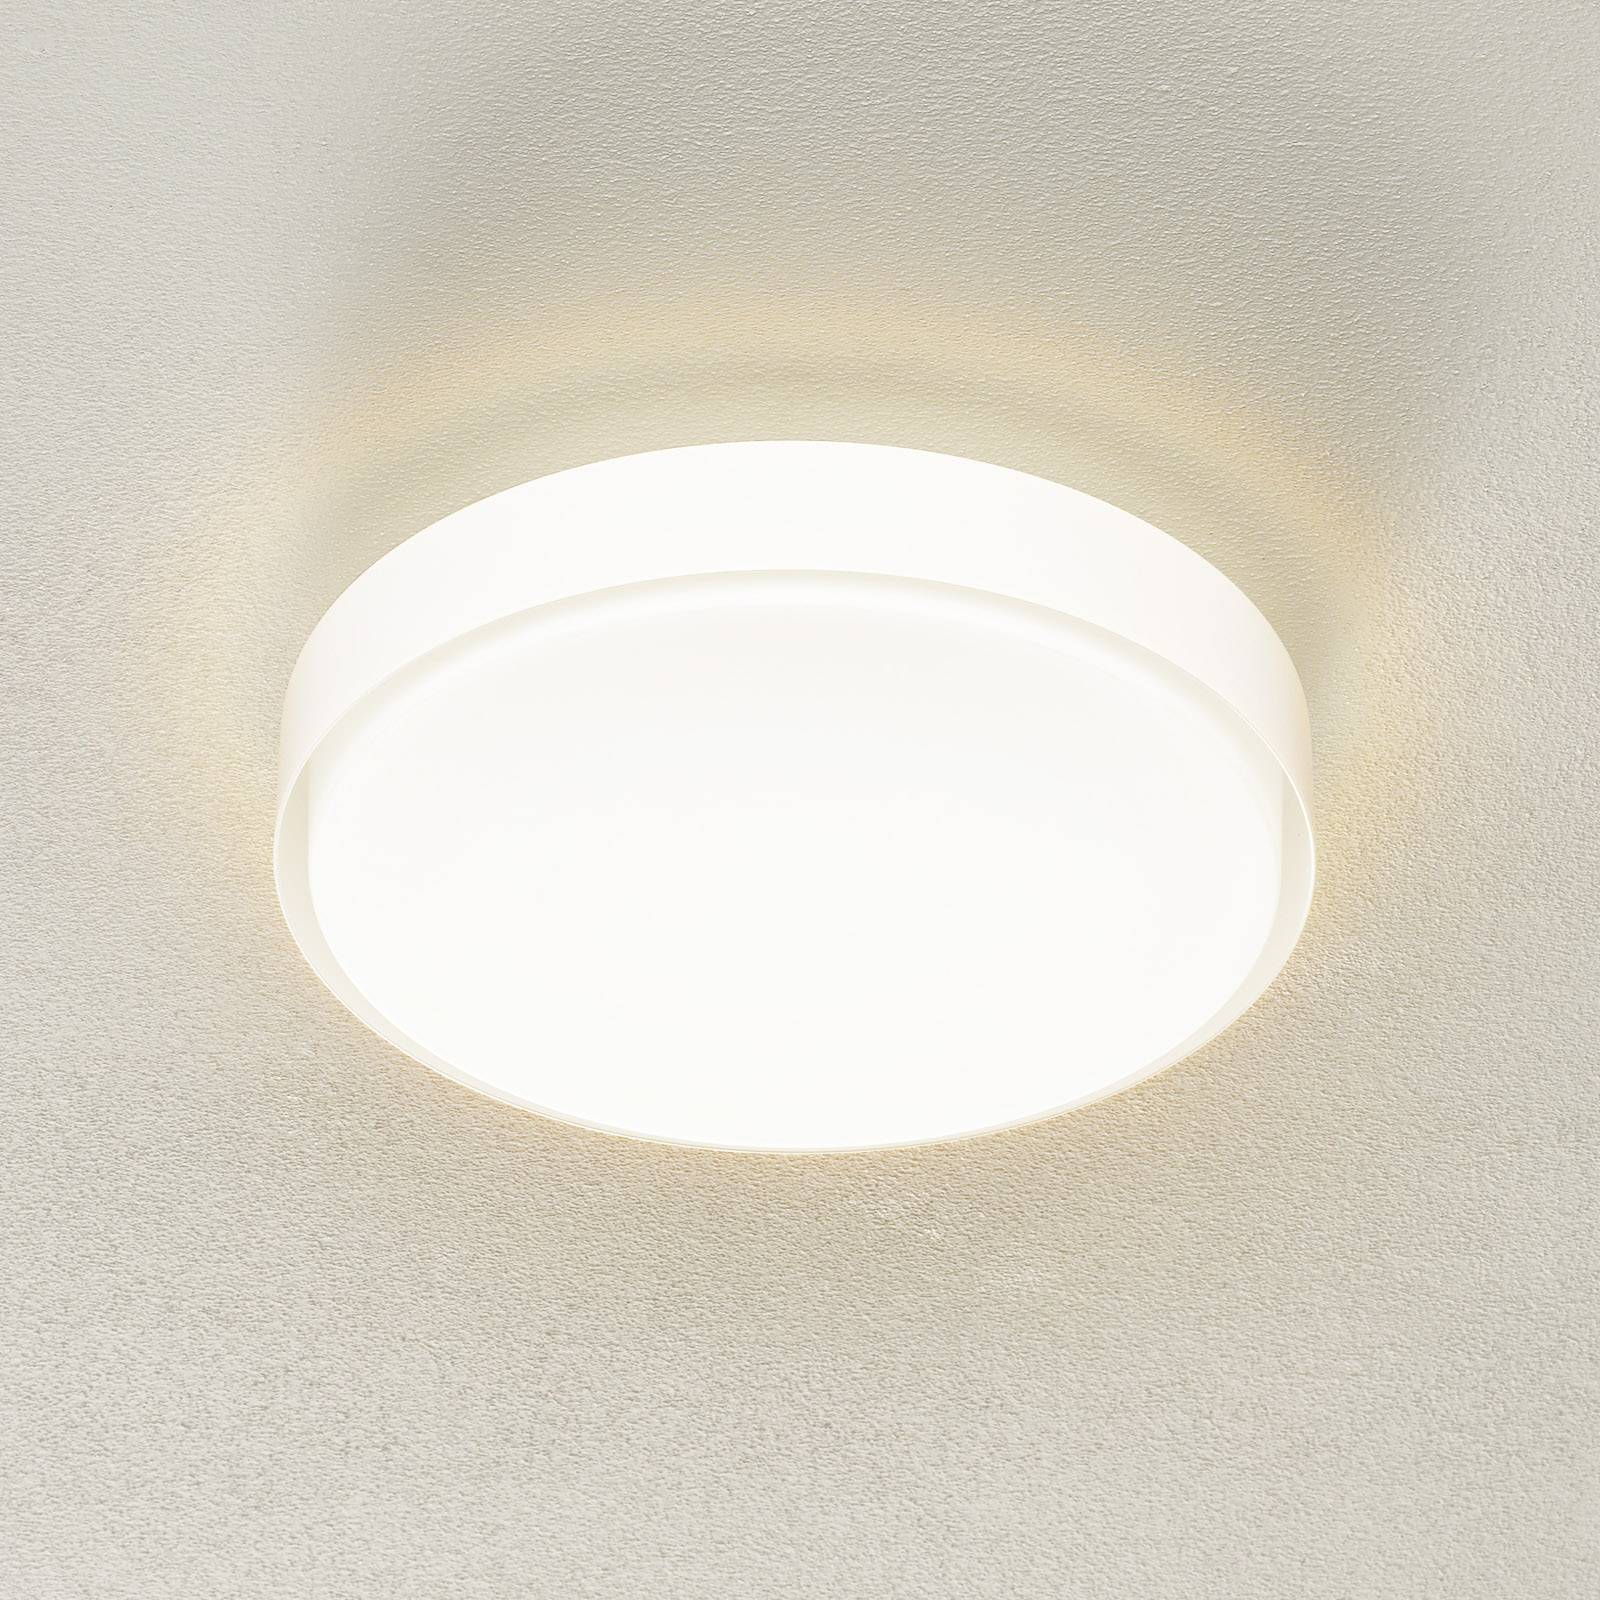 BEGA 34278 LED-kattovalaisin, valkoinen, Ø 36 cm